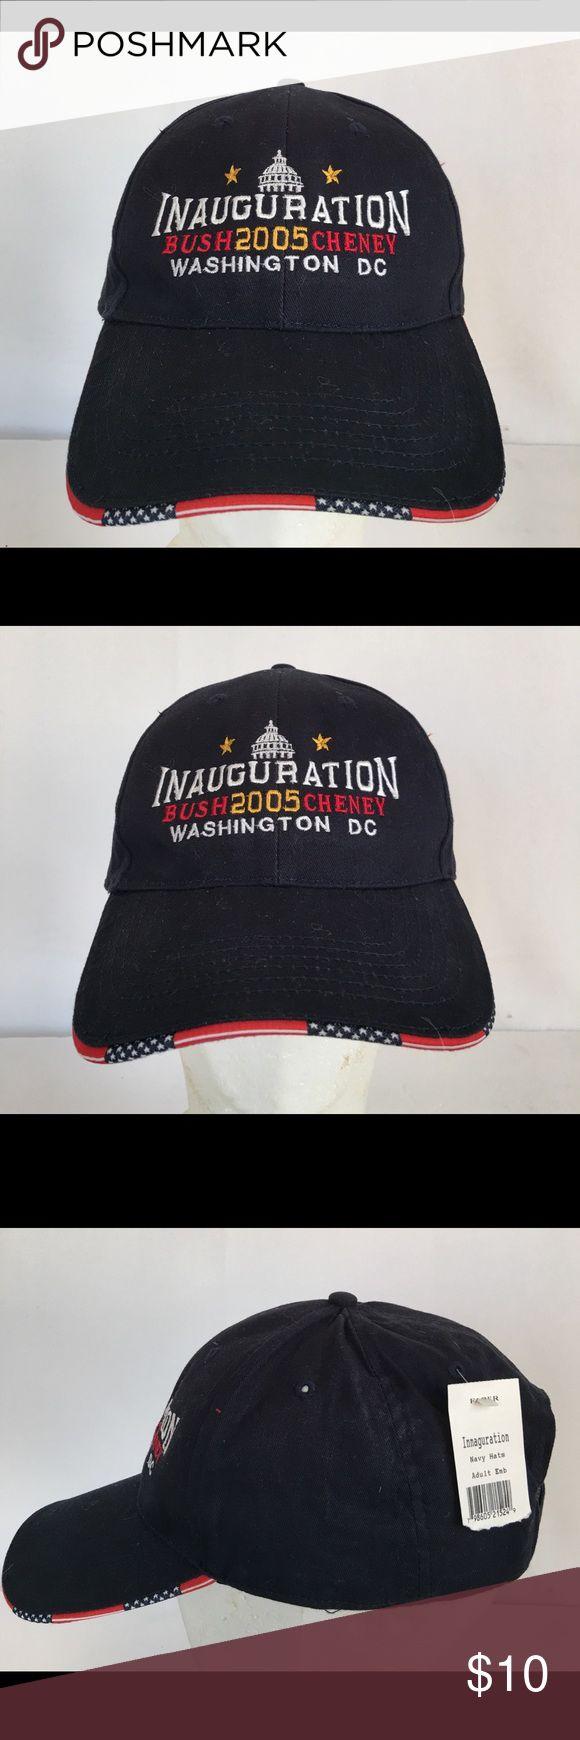 Bush/Cheney 2005 Inauguration Washington, DC Cap NWT, Bush/Cheney 2005 Inauguration Washington, DC, Adult Size Cap/Hat Accessories Hats